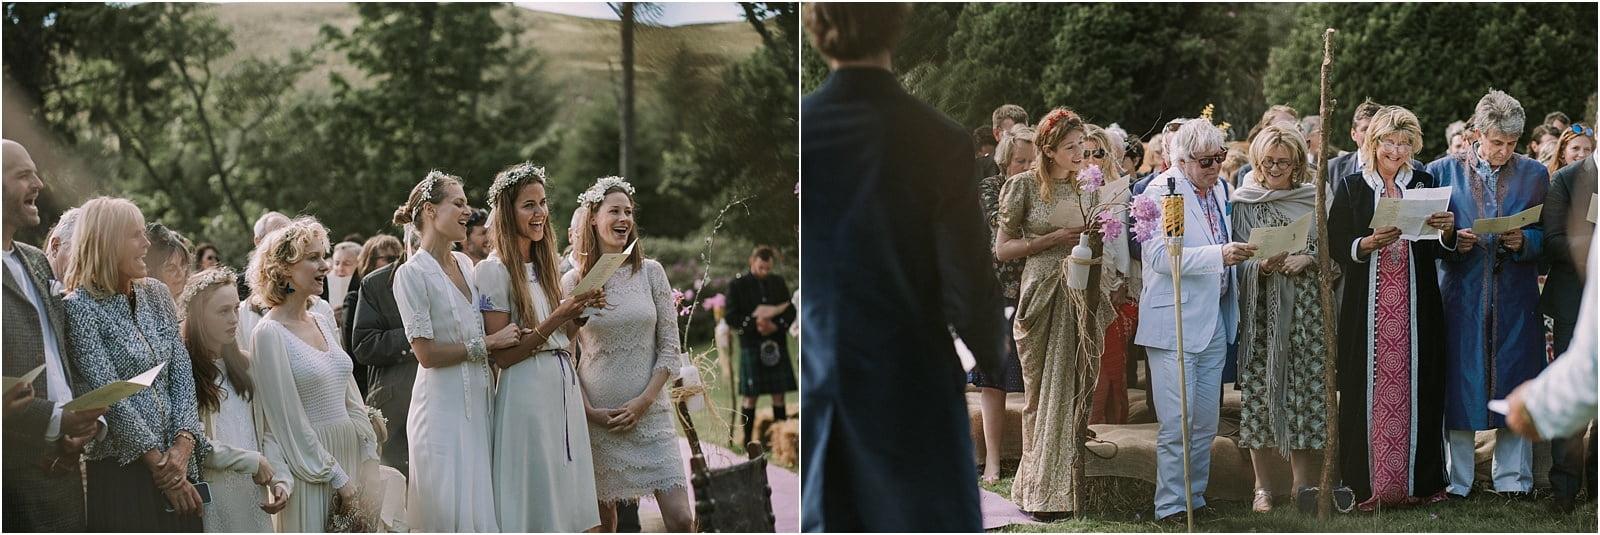 inverness-highlands-wedding-photographer-070